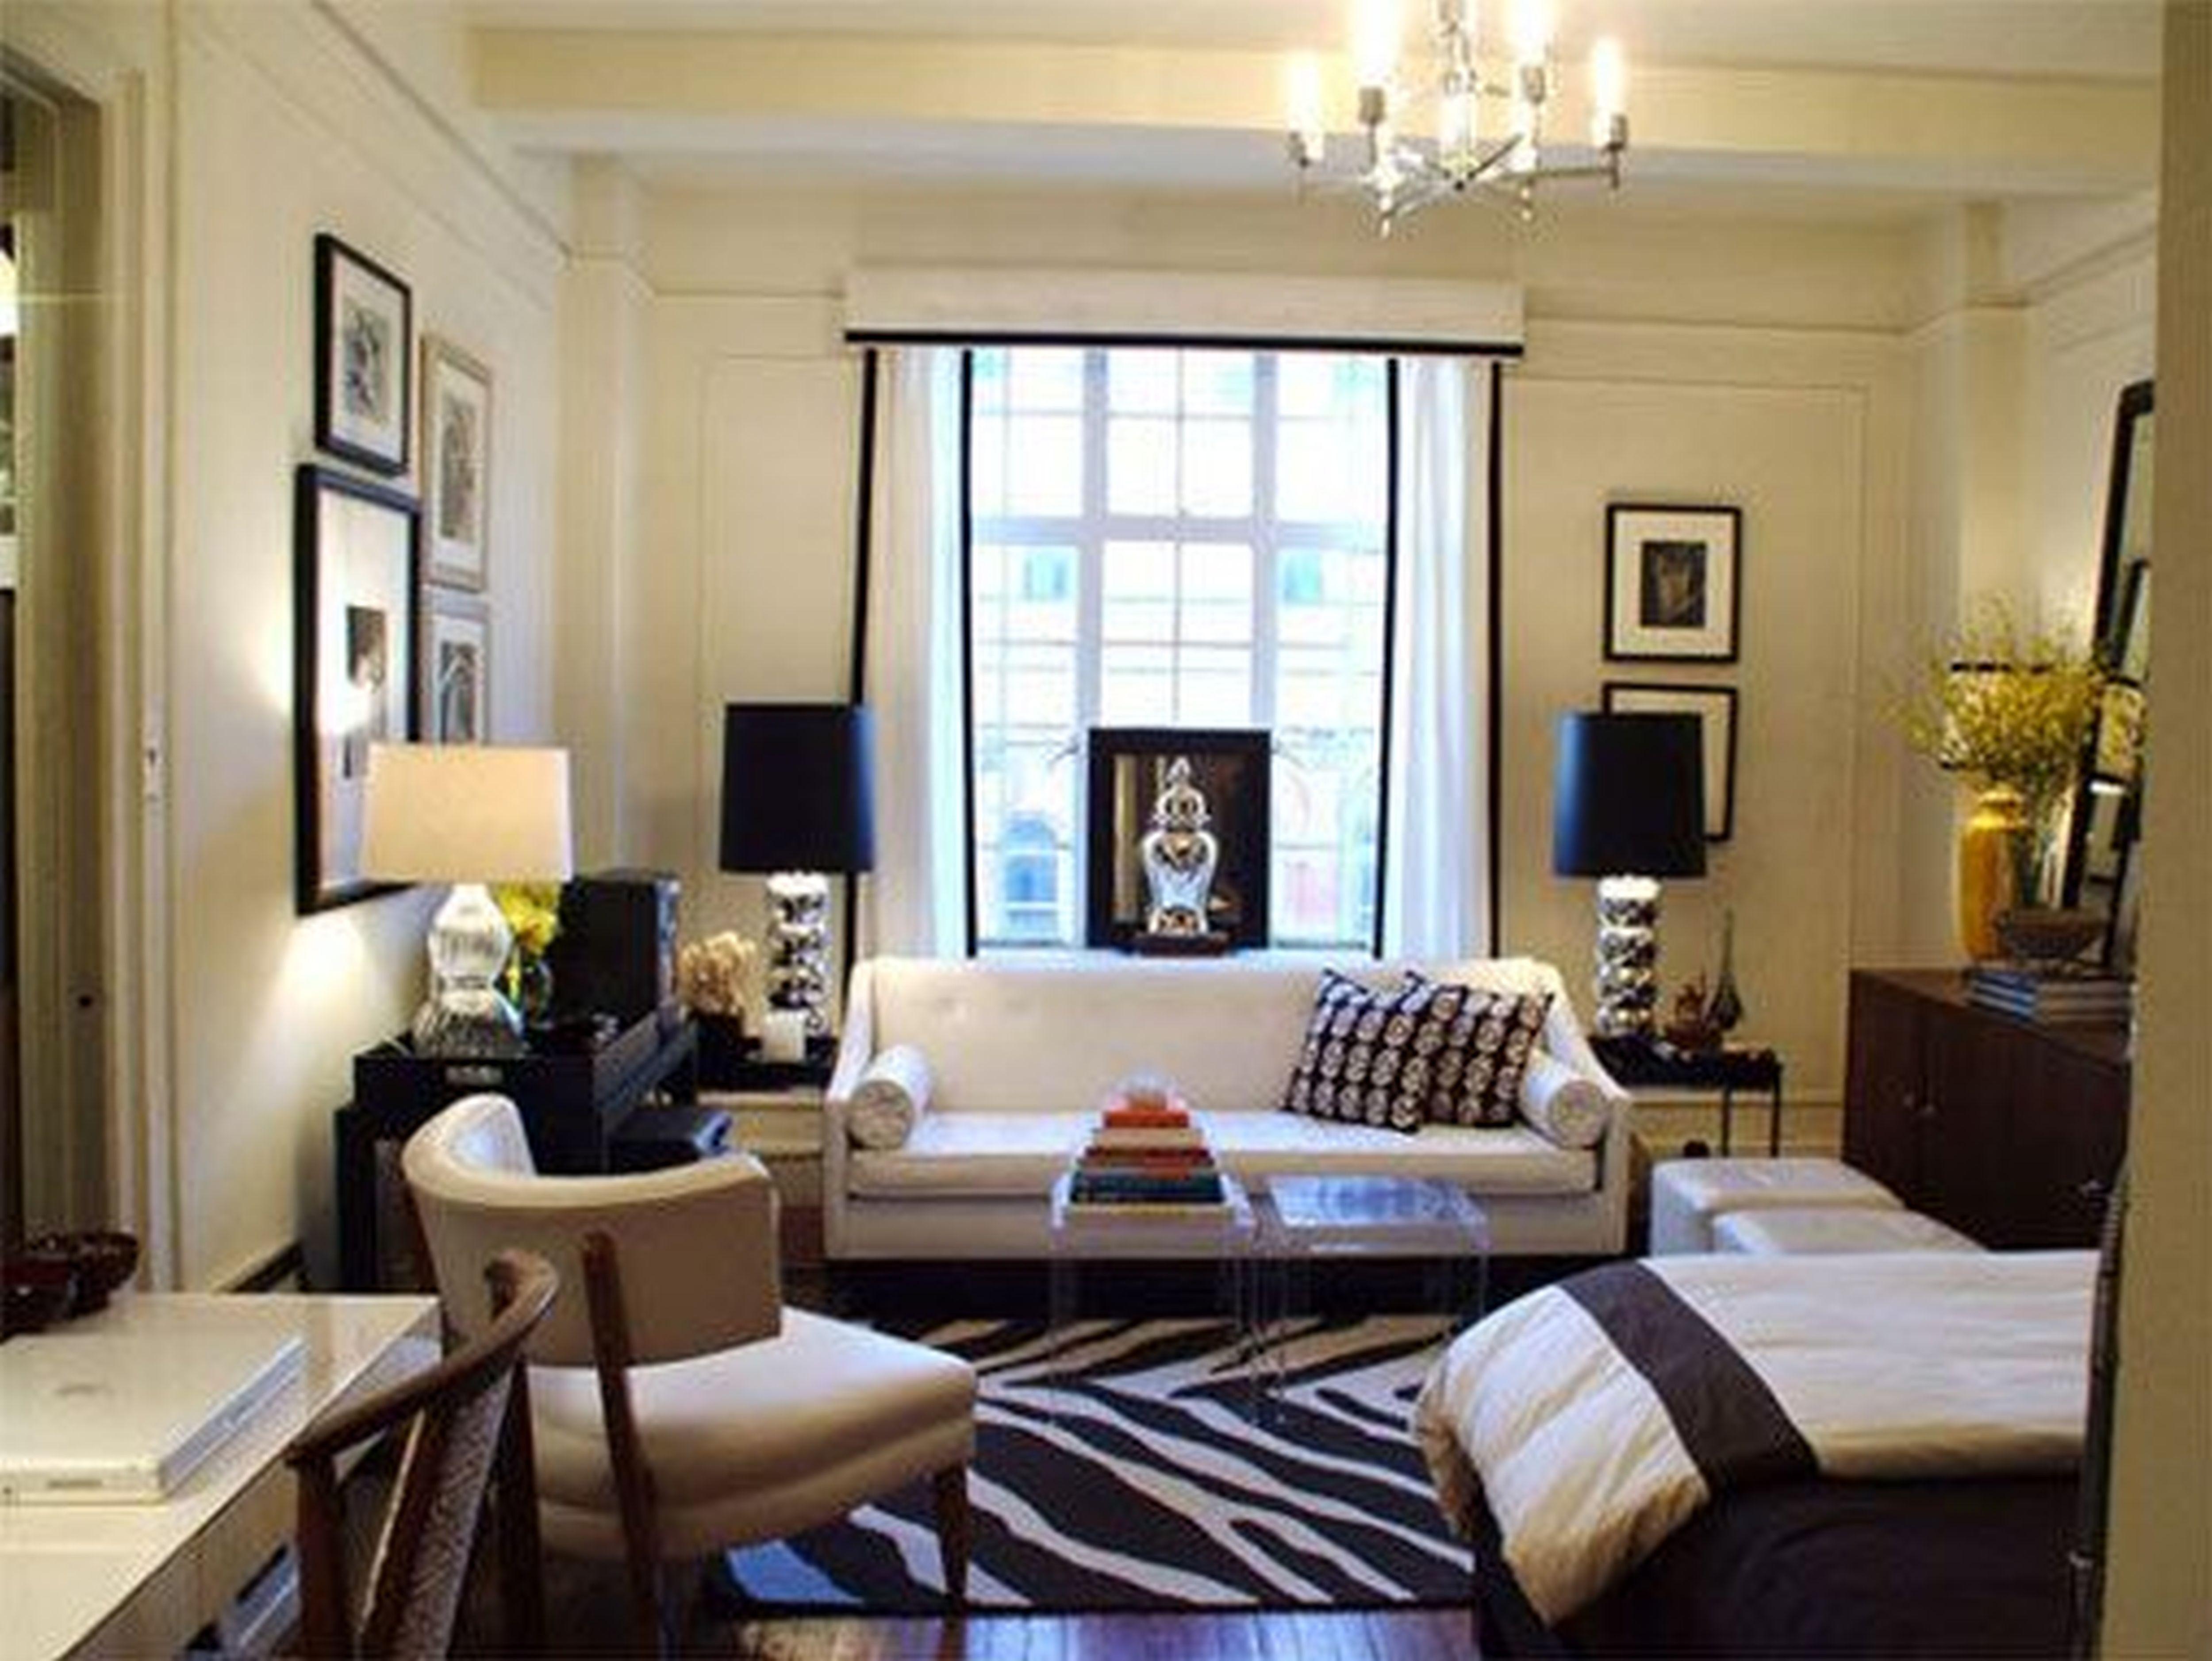 Marvelous Photo Of Tiny Apartment Ideas Decor Bedrooms Zen Design Es Apartments Living Small For